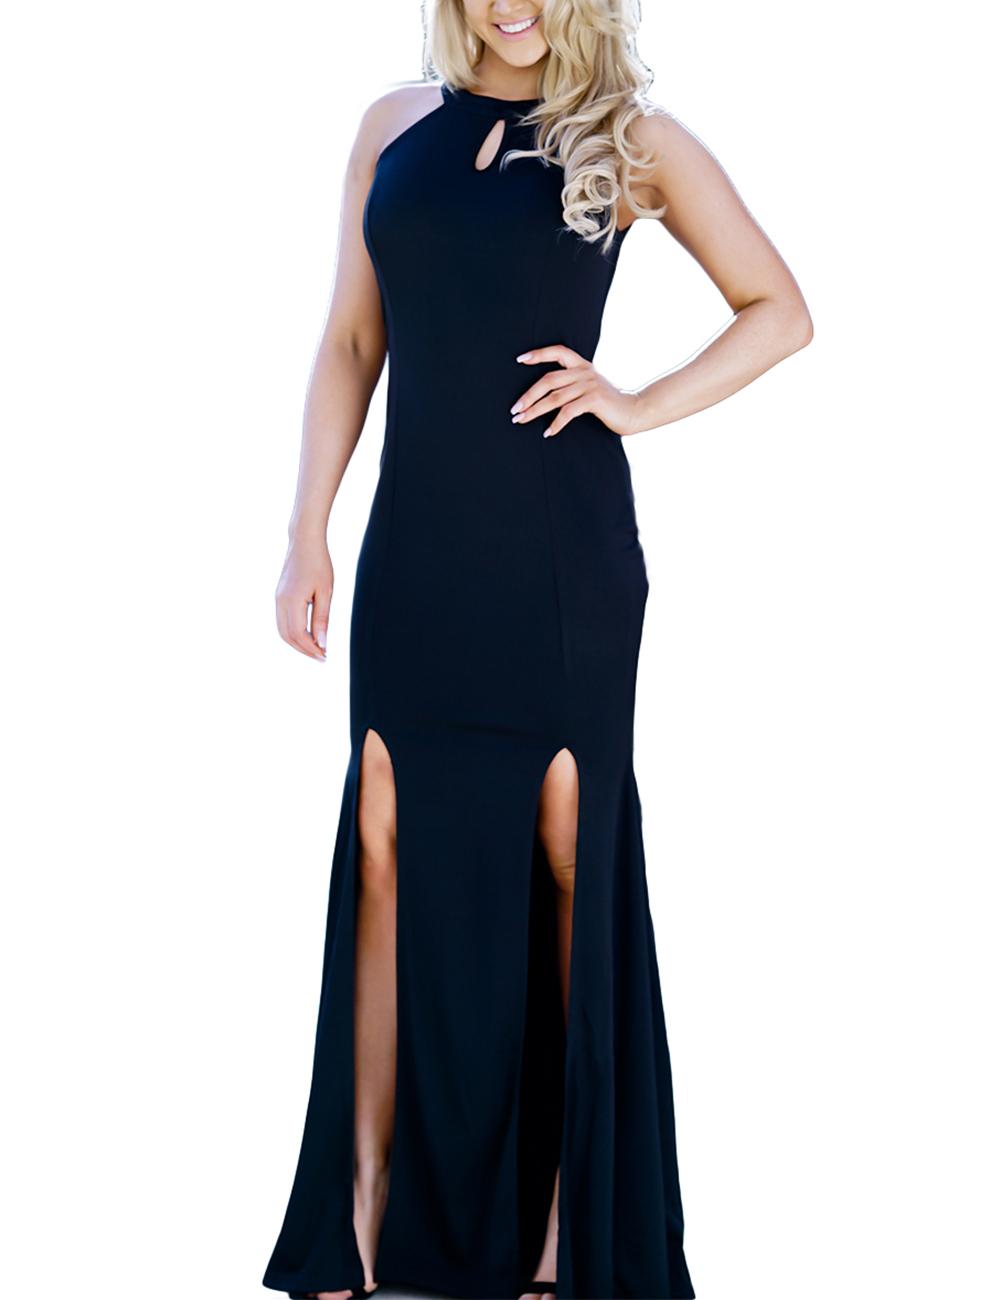 Fashionable Slit Dress Sexy Sleeveless Bare-back Skirt Gift Party Nightclub Outfits